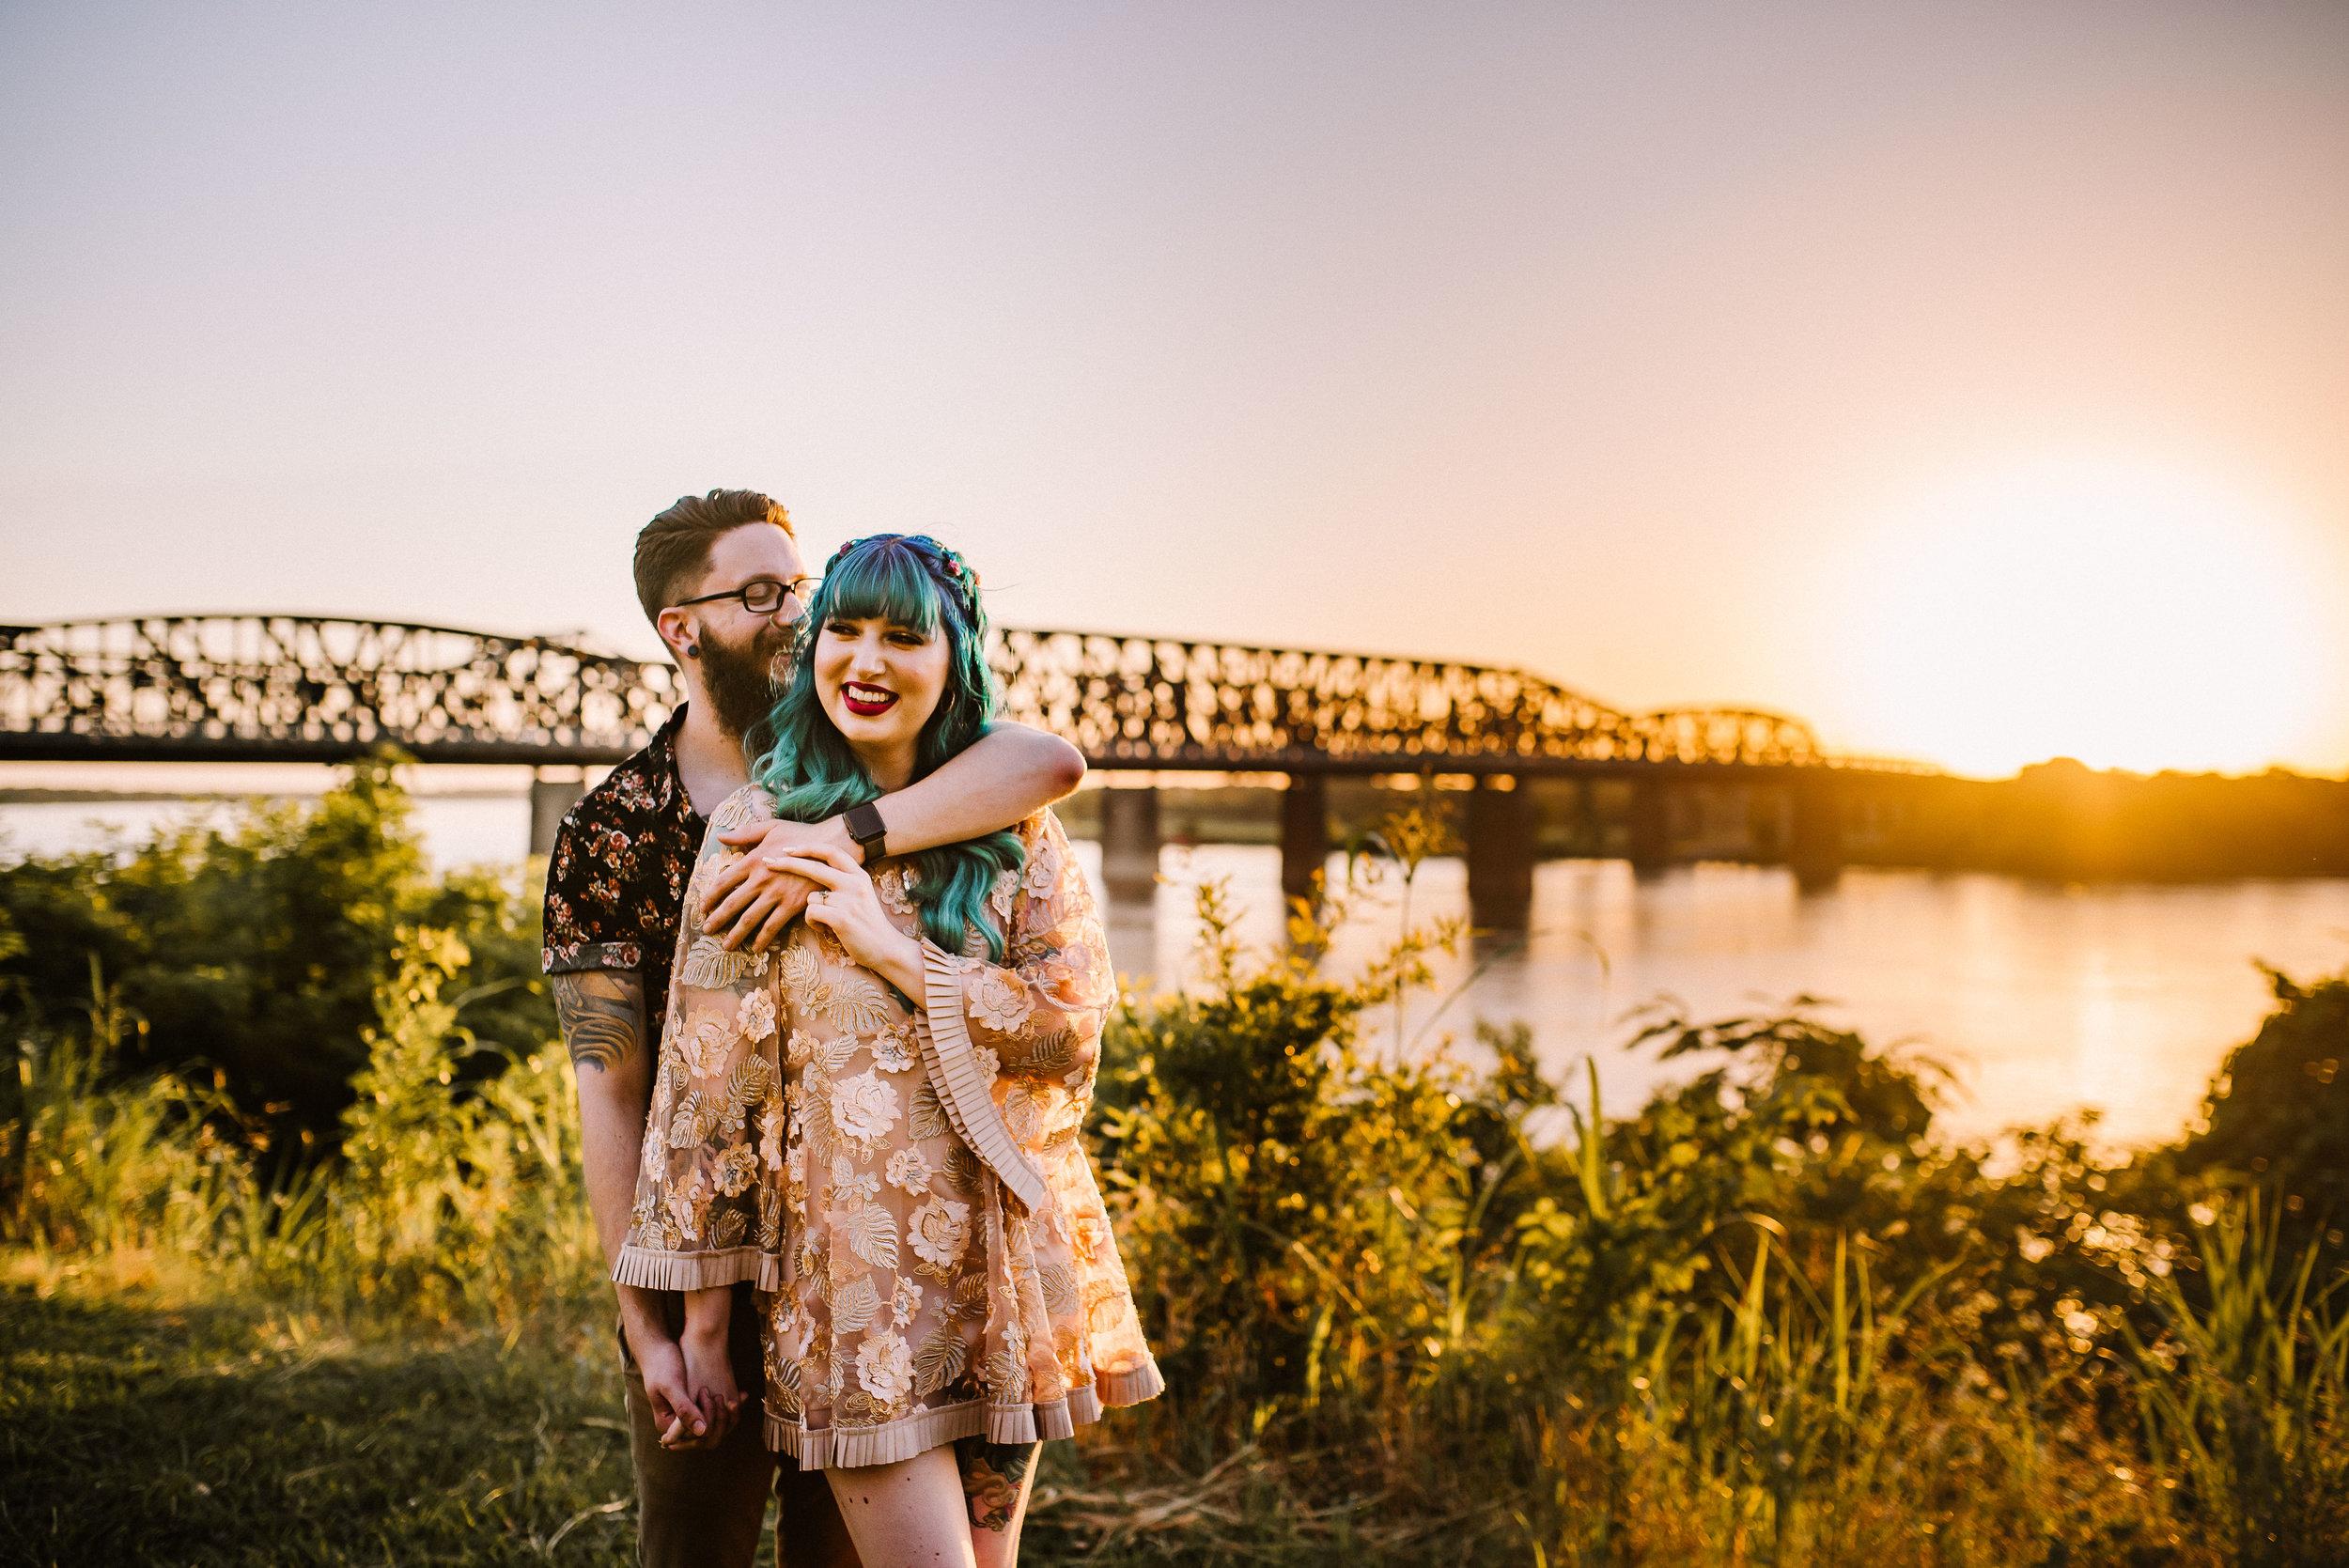 Kelly & Matt_Engagement Session_Wilson Arkansas_Ashley Benham Photography-170.jpg